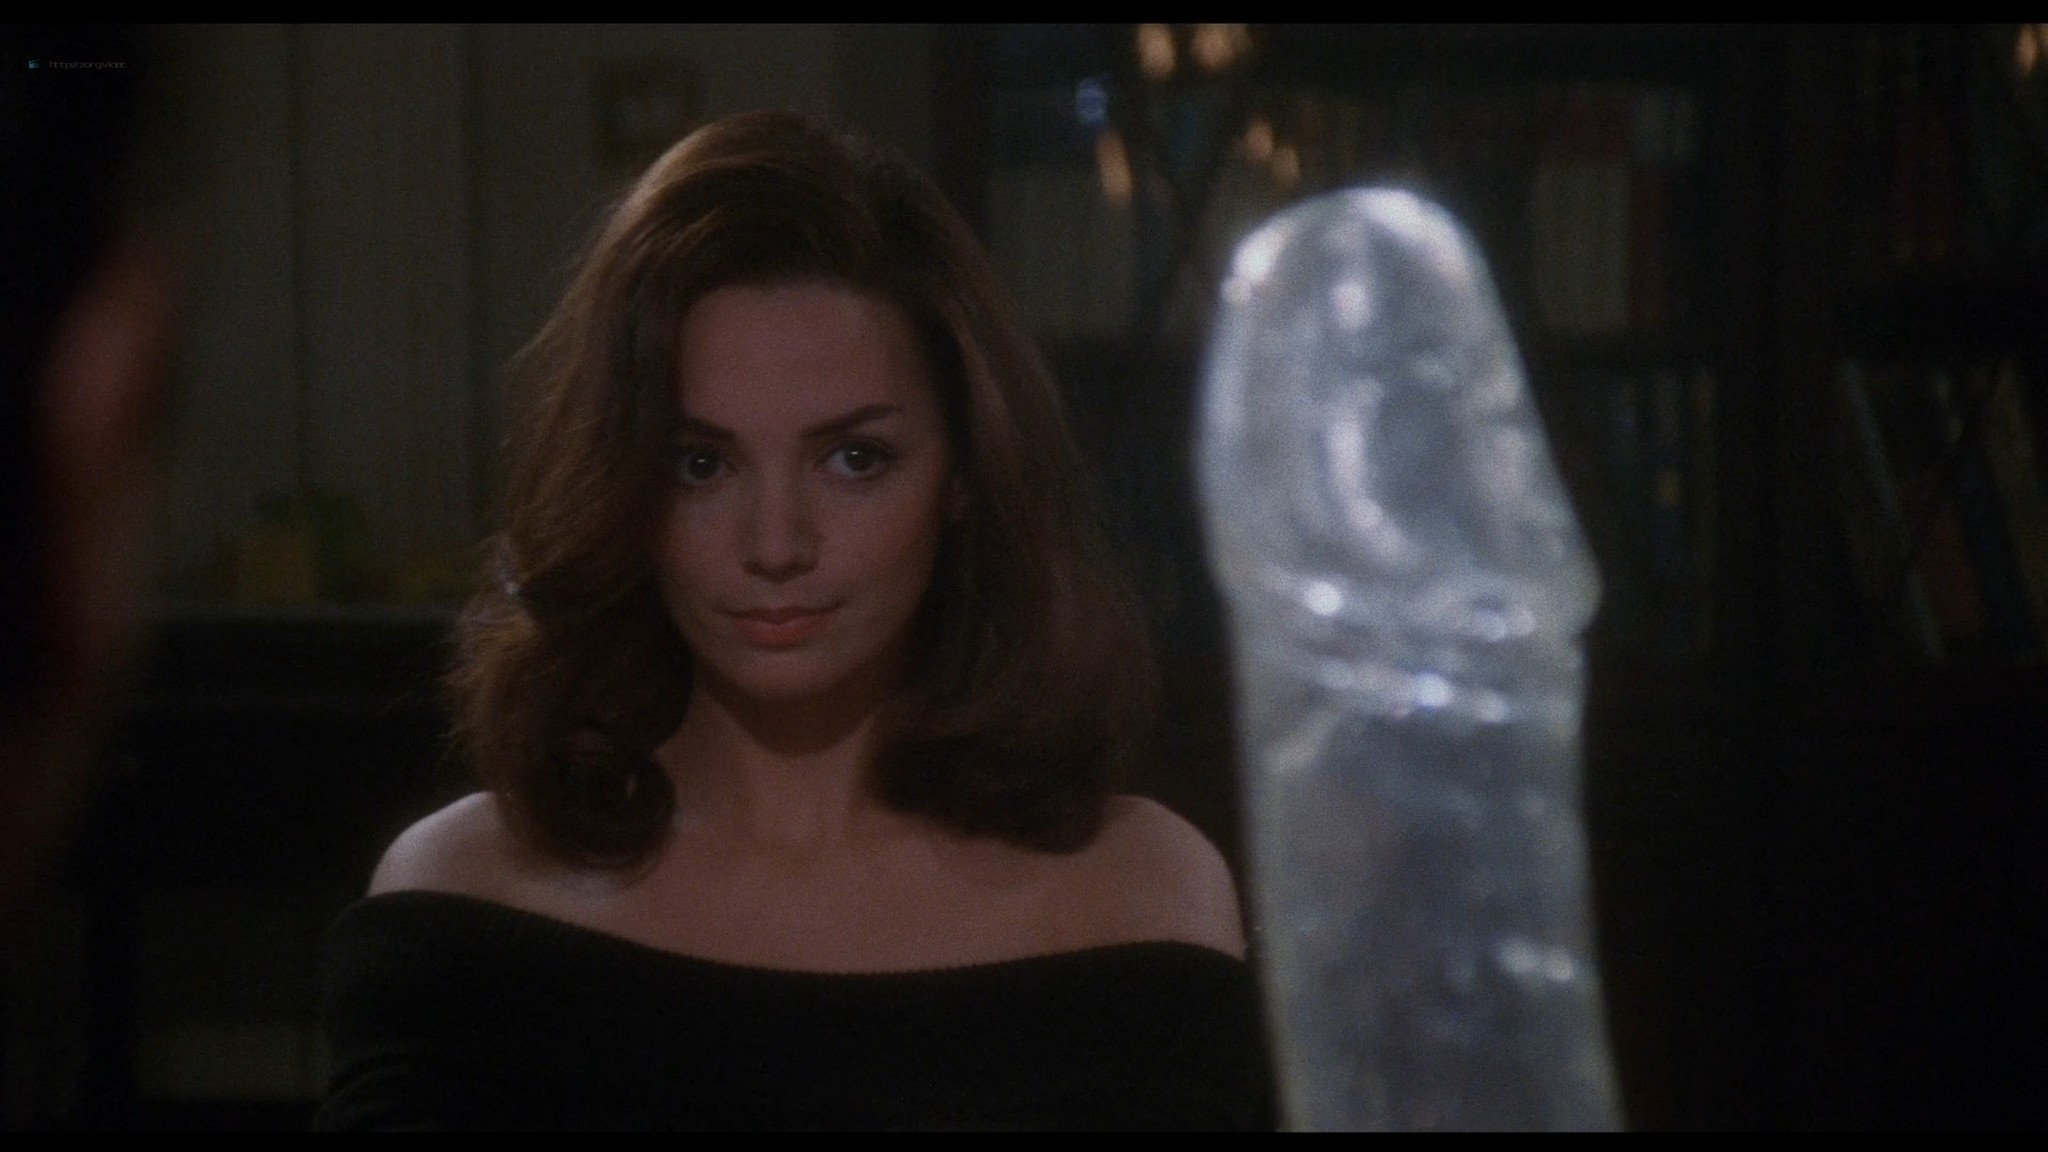 Bridget Fonda nude butt boobs Britt Ekland nude Joanne Whalley hot - Scandal (1989) HD 1080p BluRay (17)